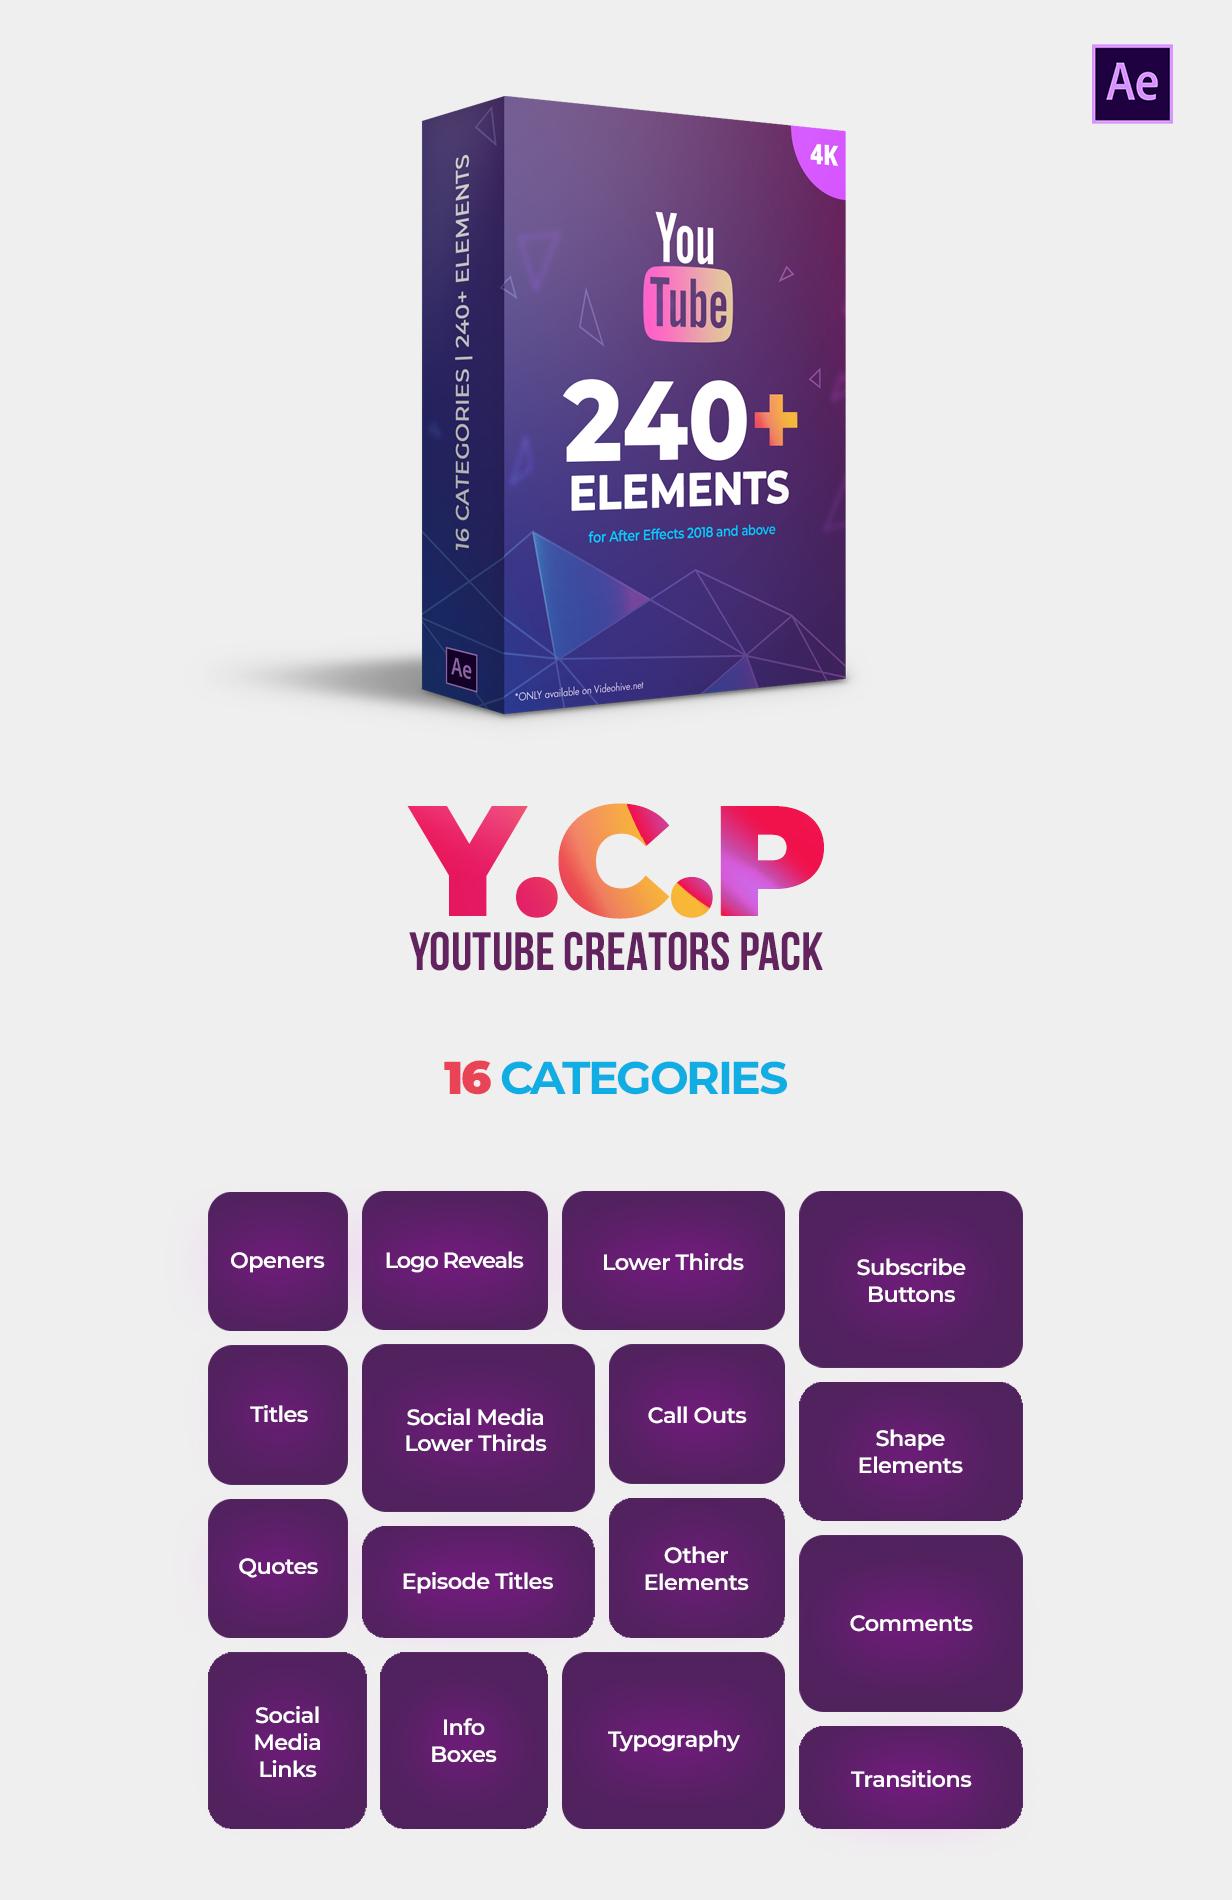 Youtube Creators Pack - 1